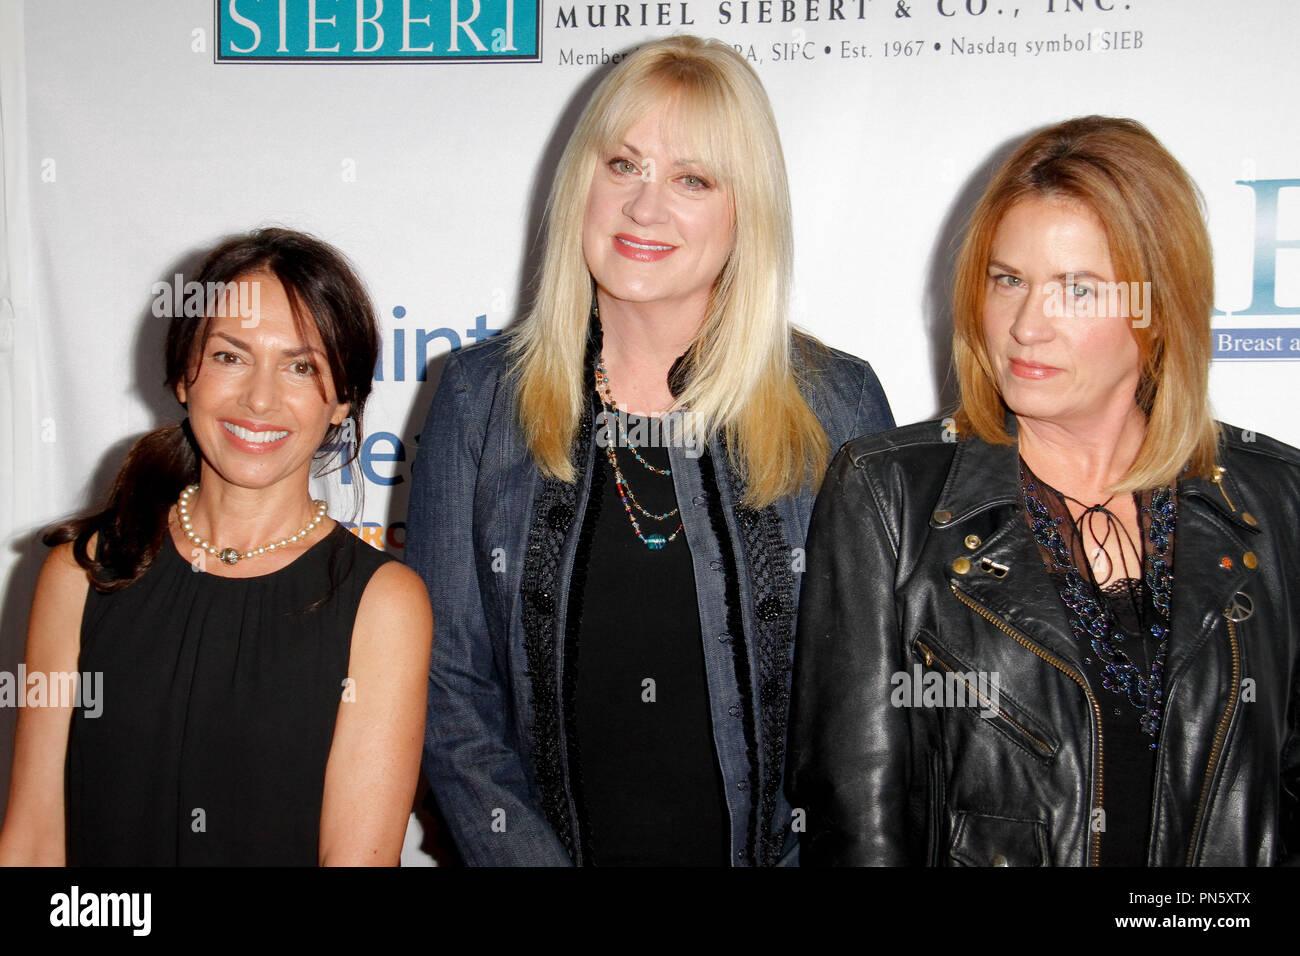 1c9d37d037ec0 Susanna Hoffs, Debbi Peterson, Vicki Peterson, (The Bangles) at the ...